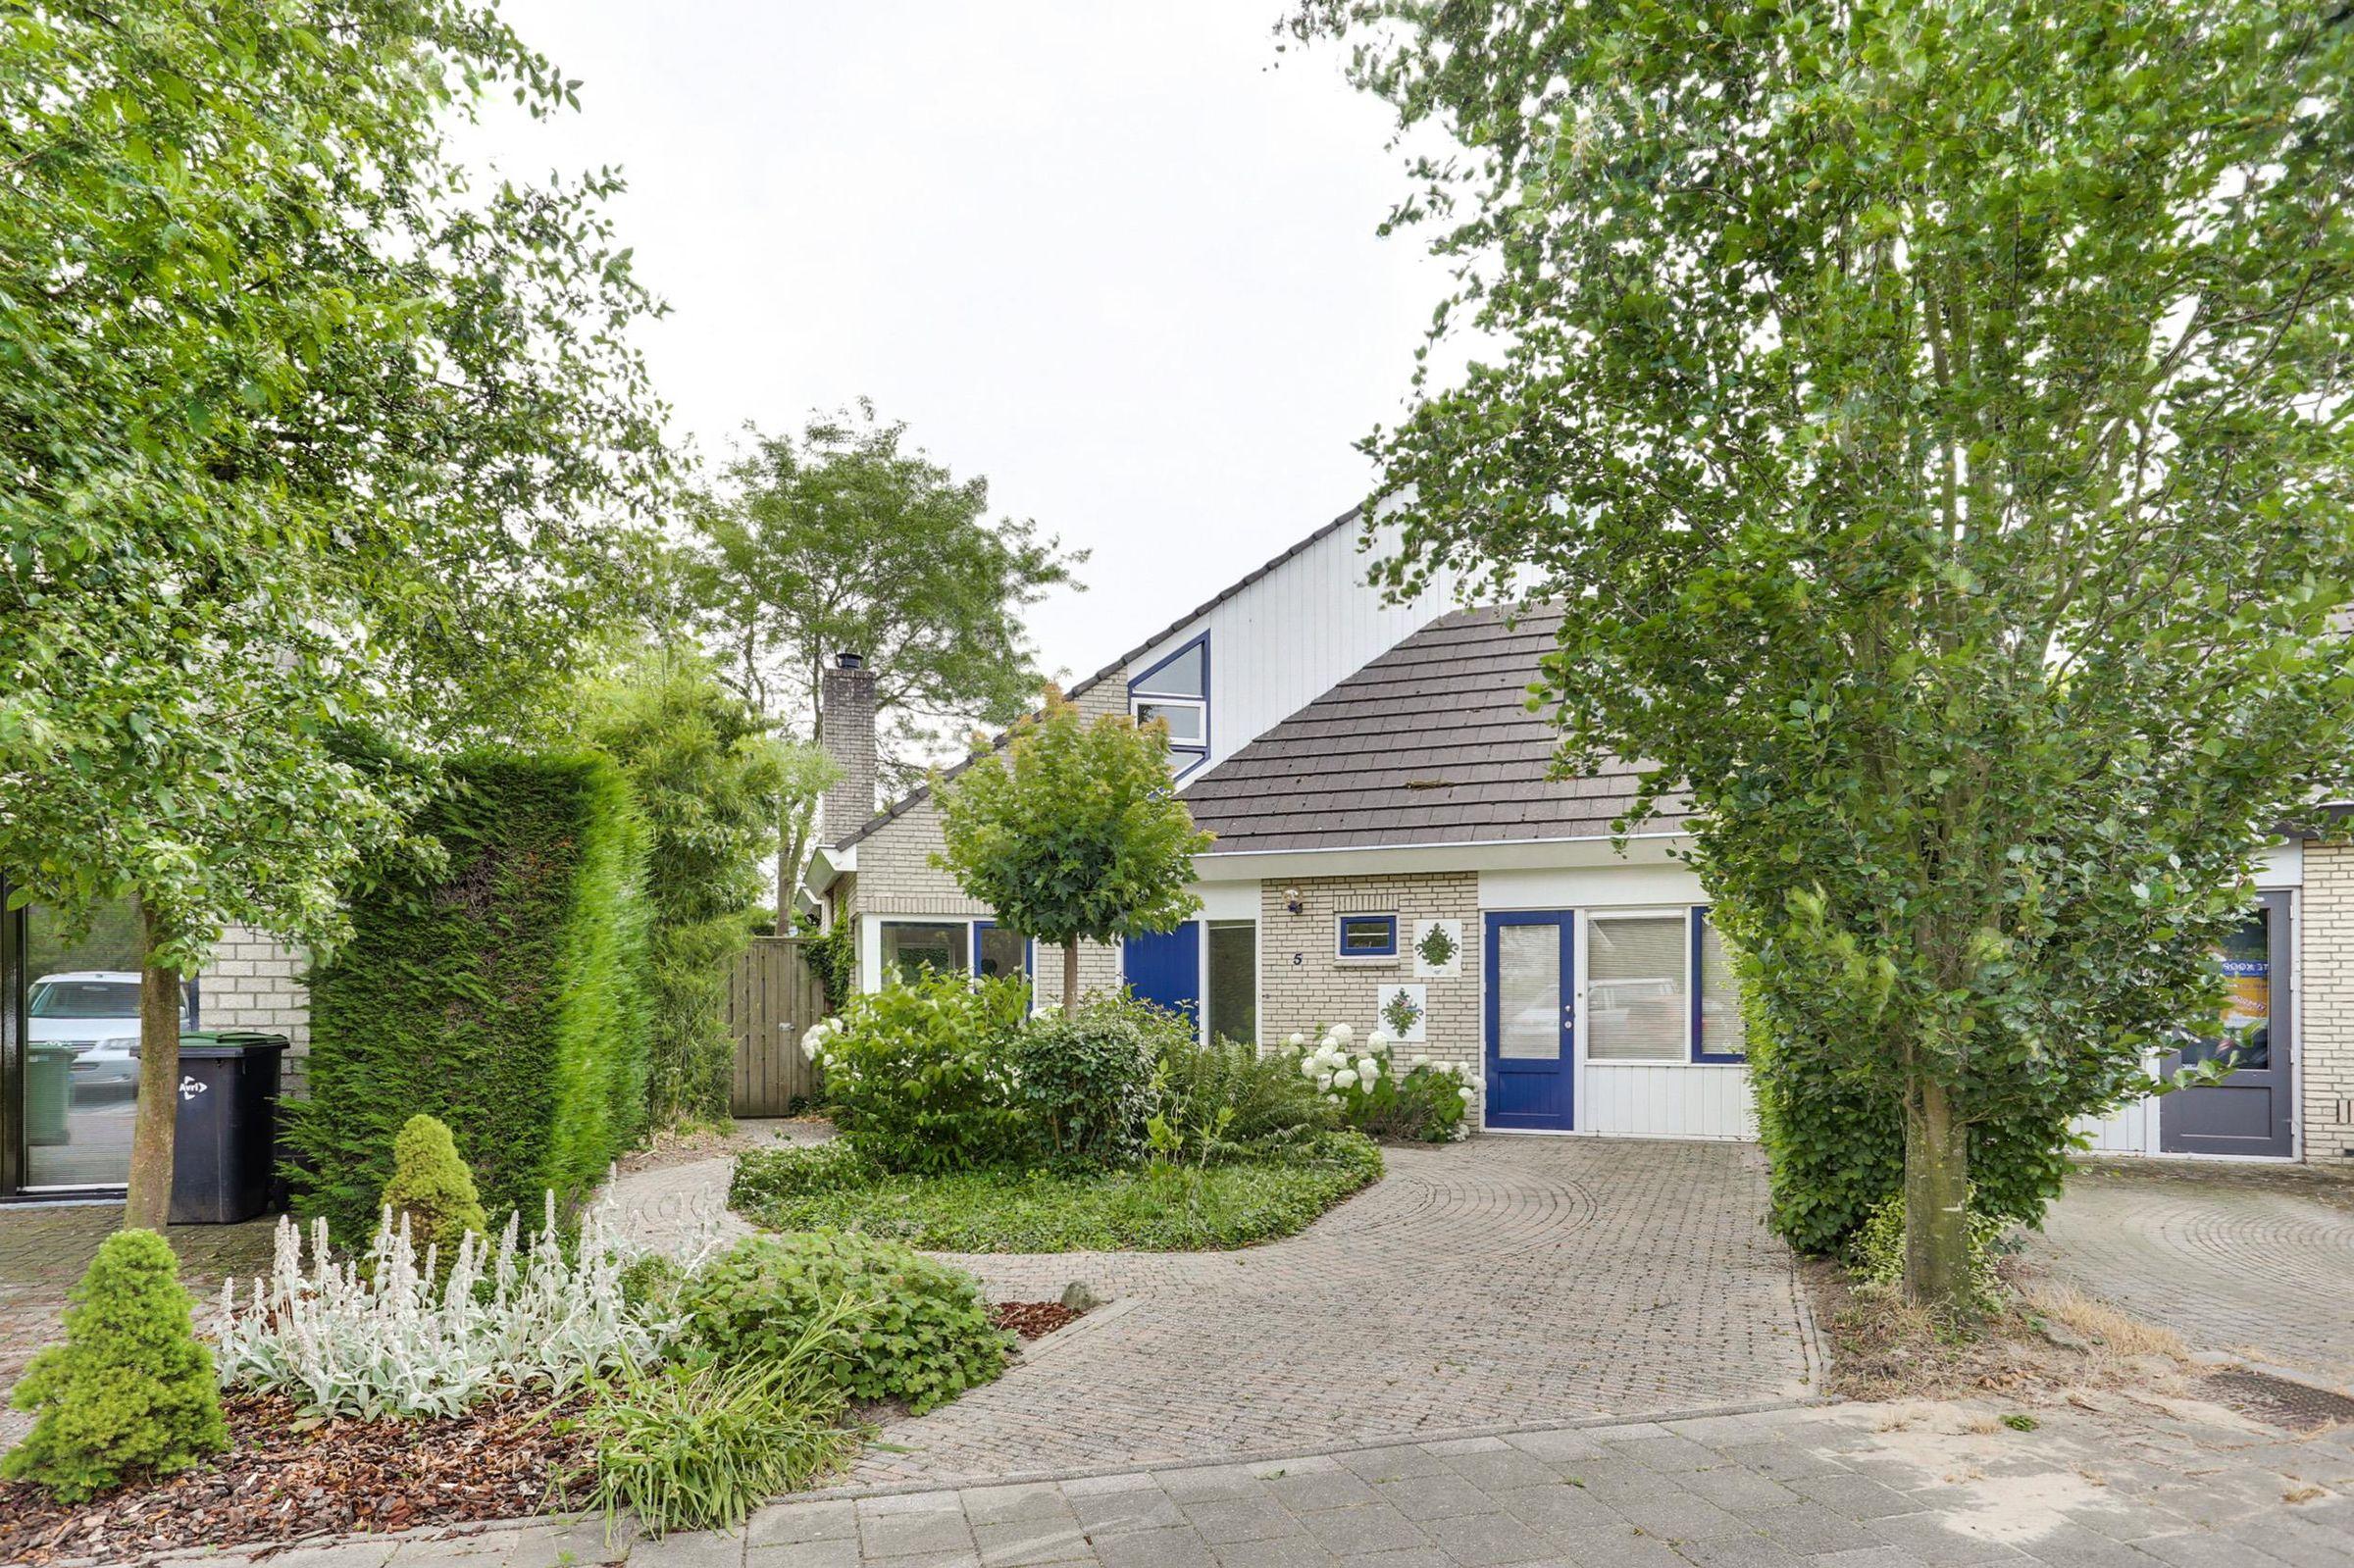 Groenwal 5, Zaltbommel